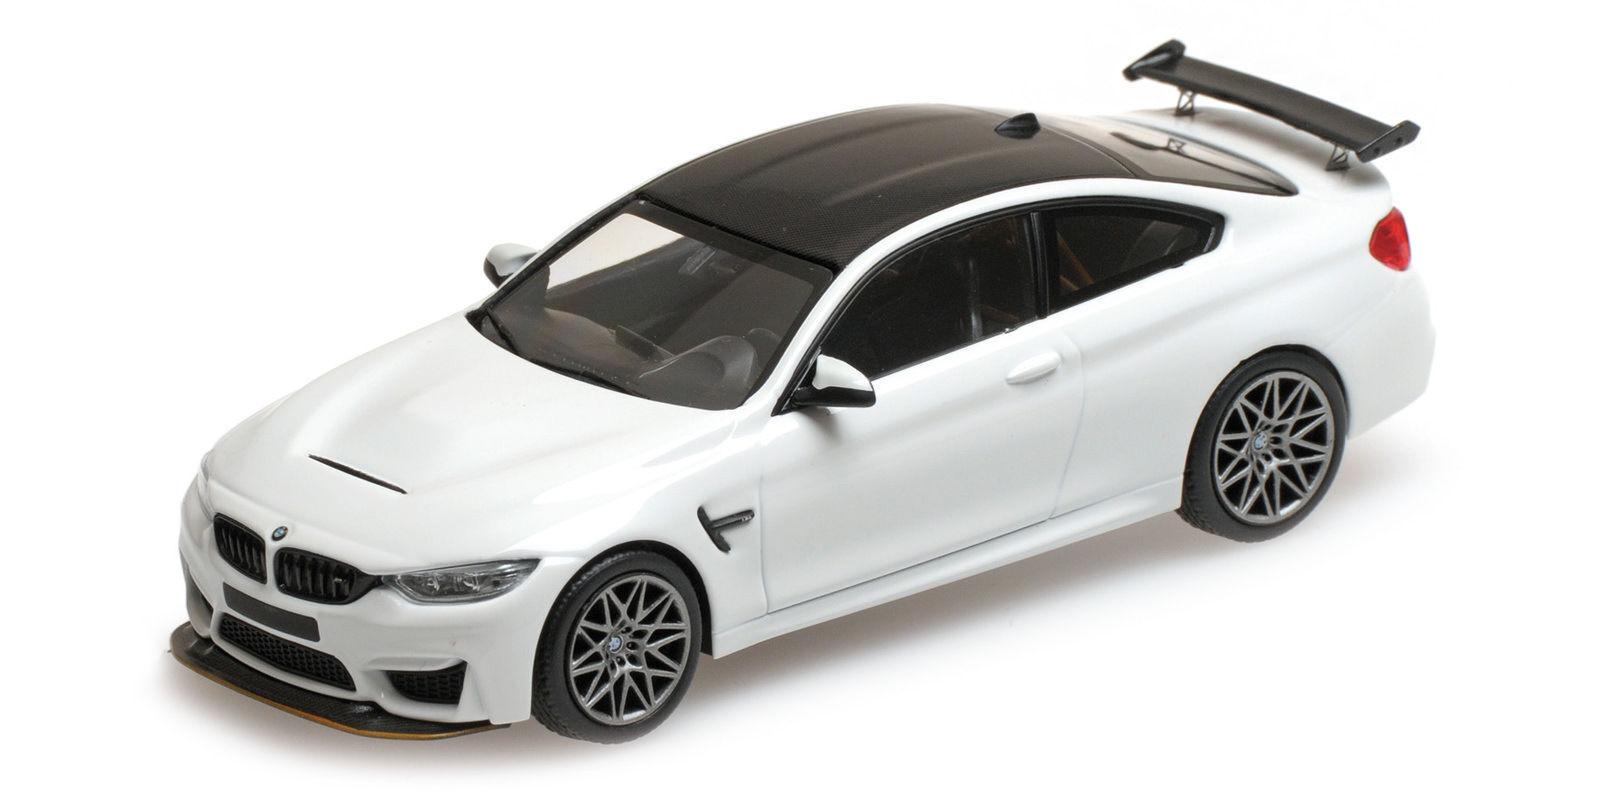 BMW M4 GTS 4-Series F82 Coupe 2016 Alpina bianca grigio Rims Minichamps 410025221